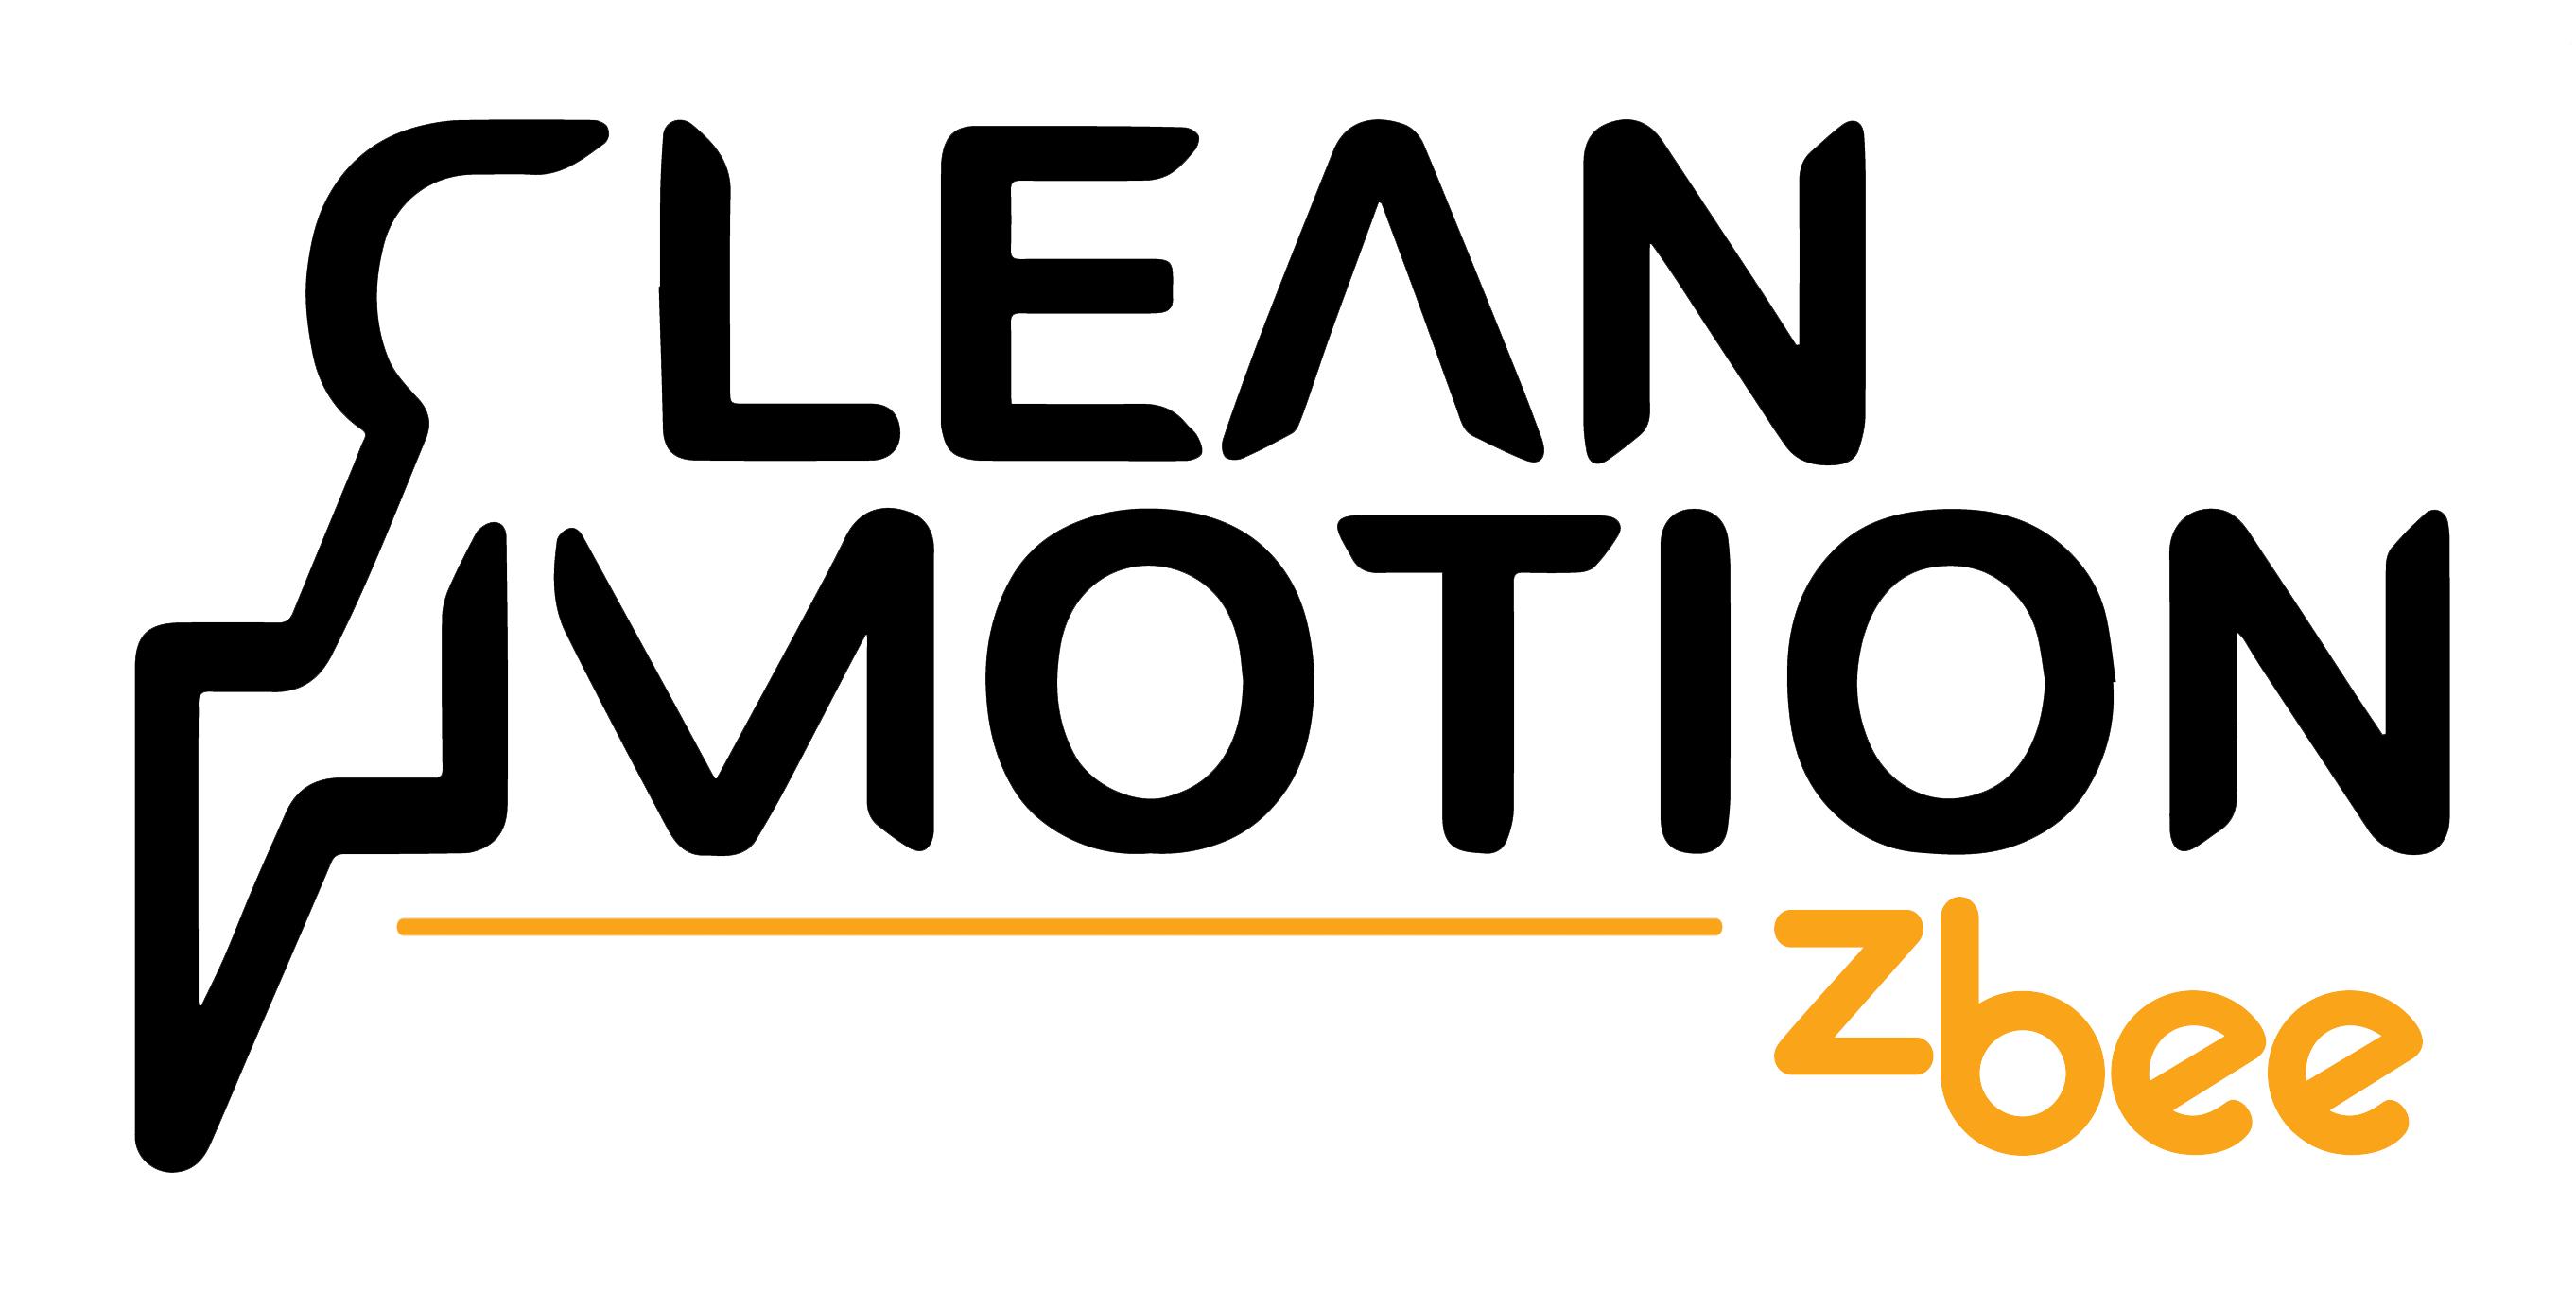 Clean-Motion-Zbee-logo,-origianl